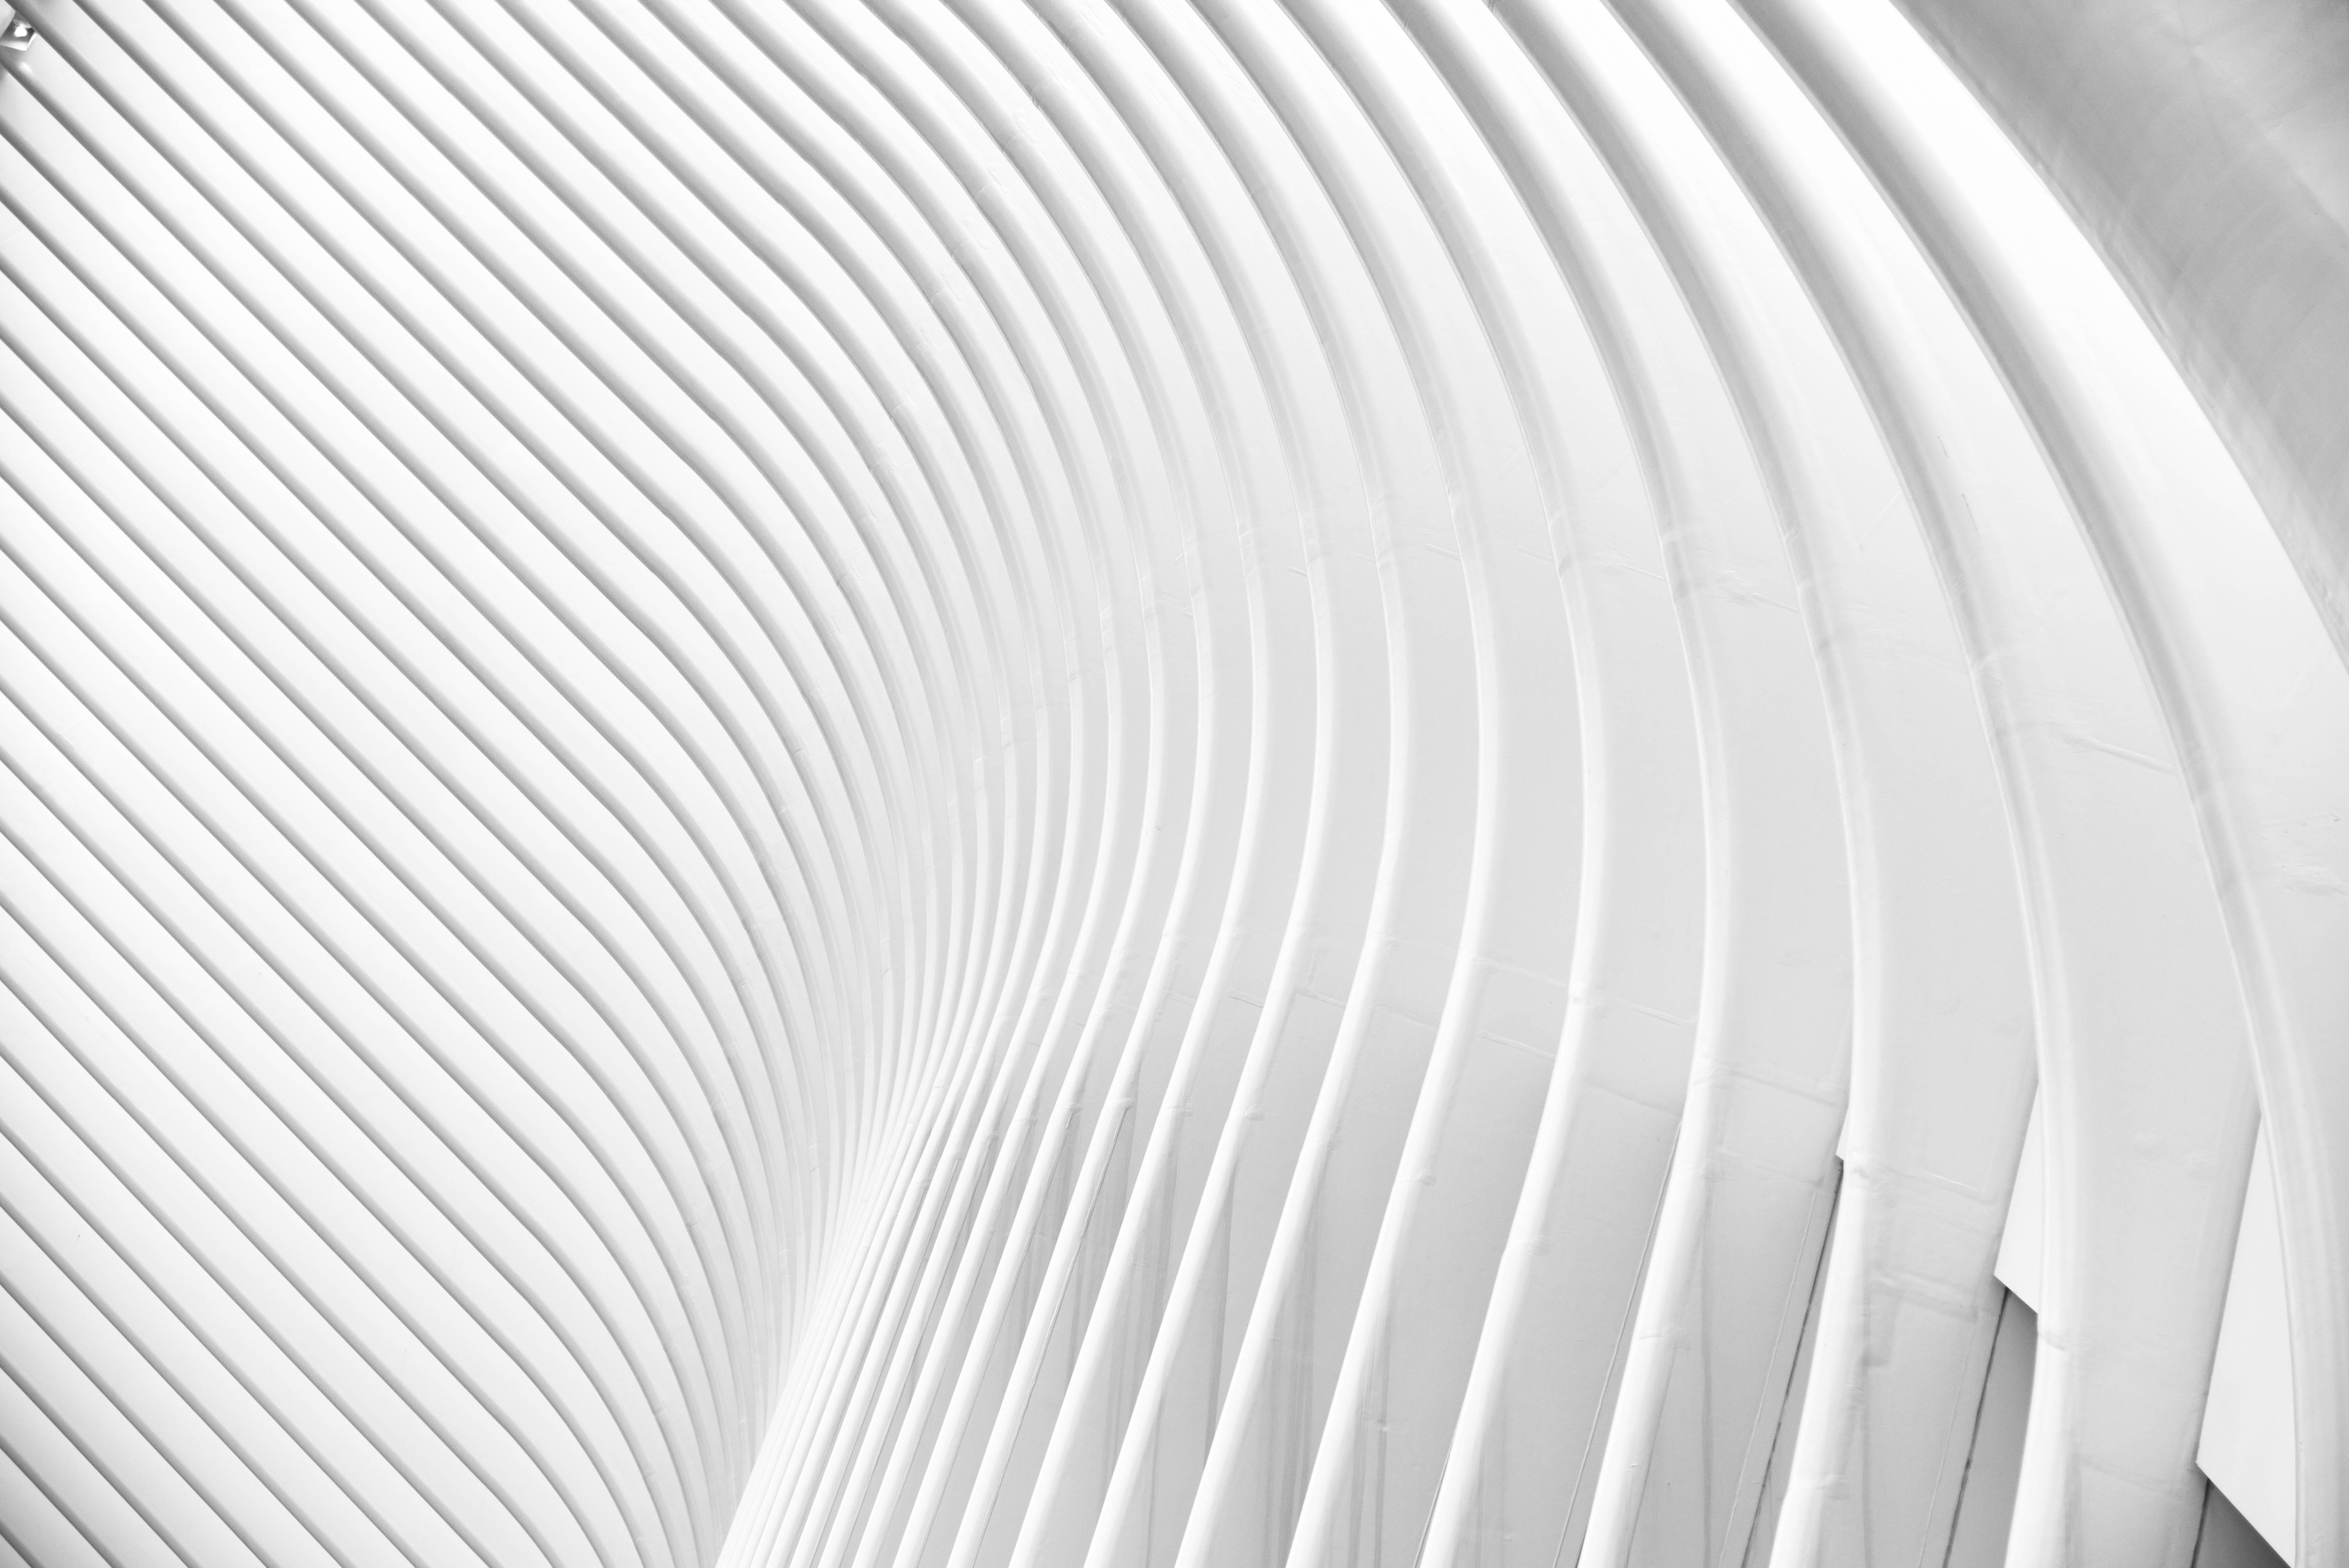 Foto profissional grátis de arquitetura, branco, curva, design